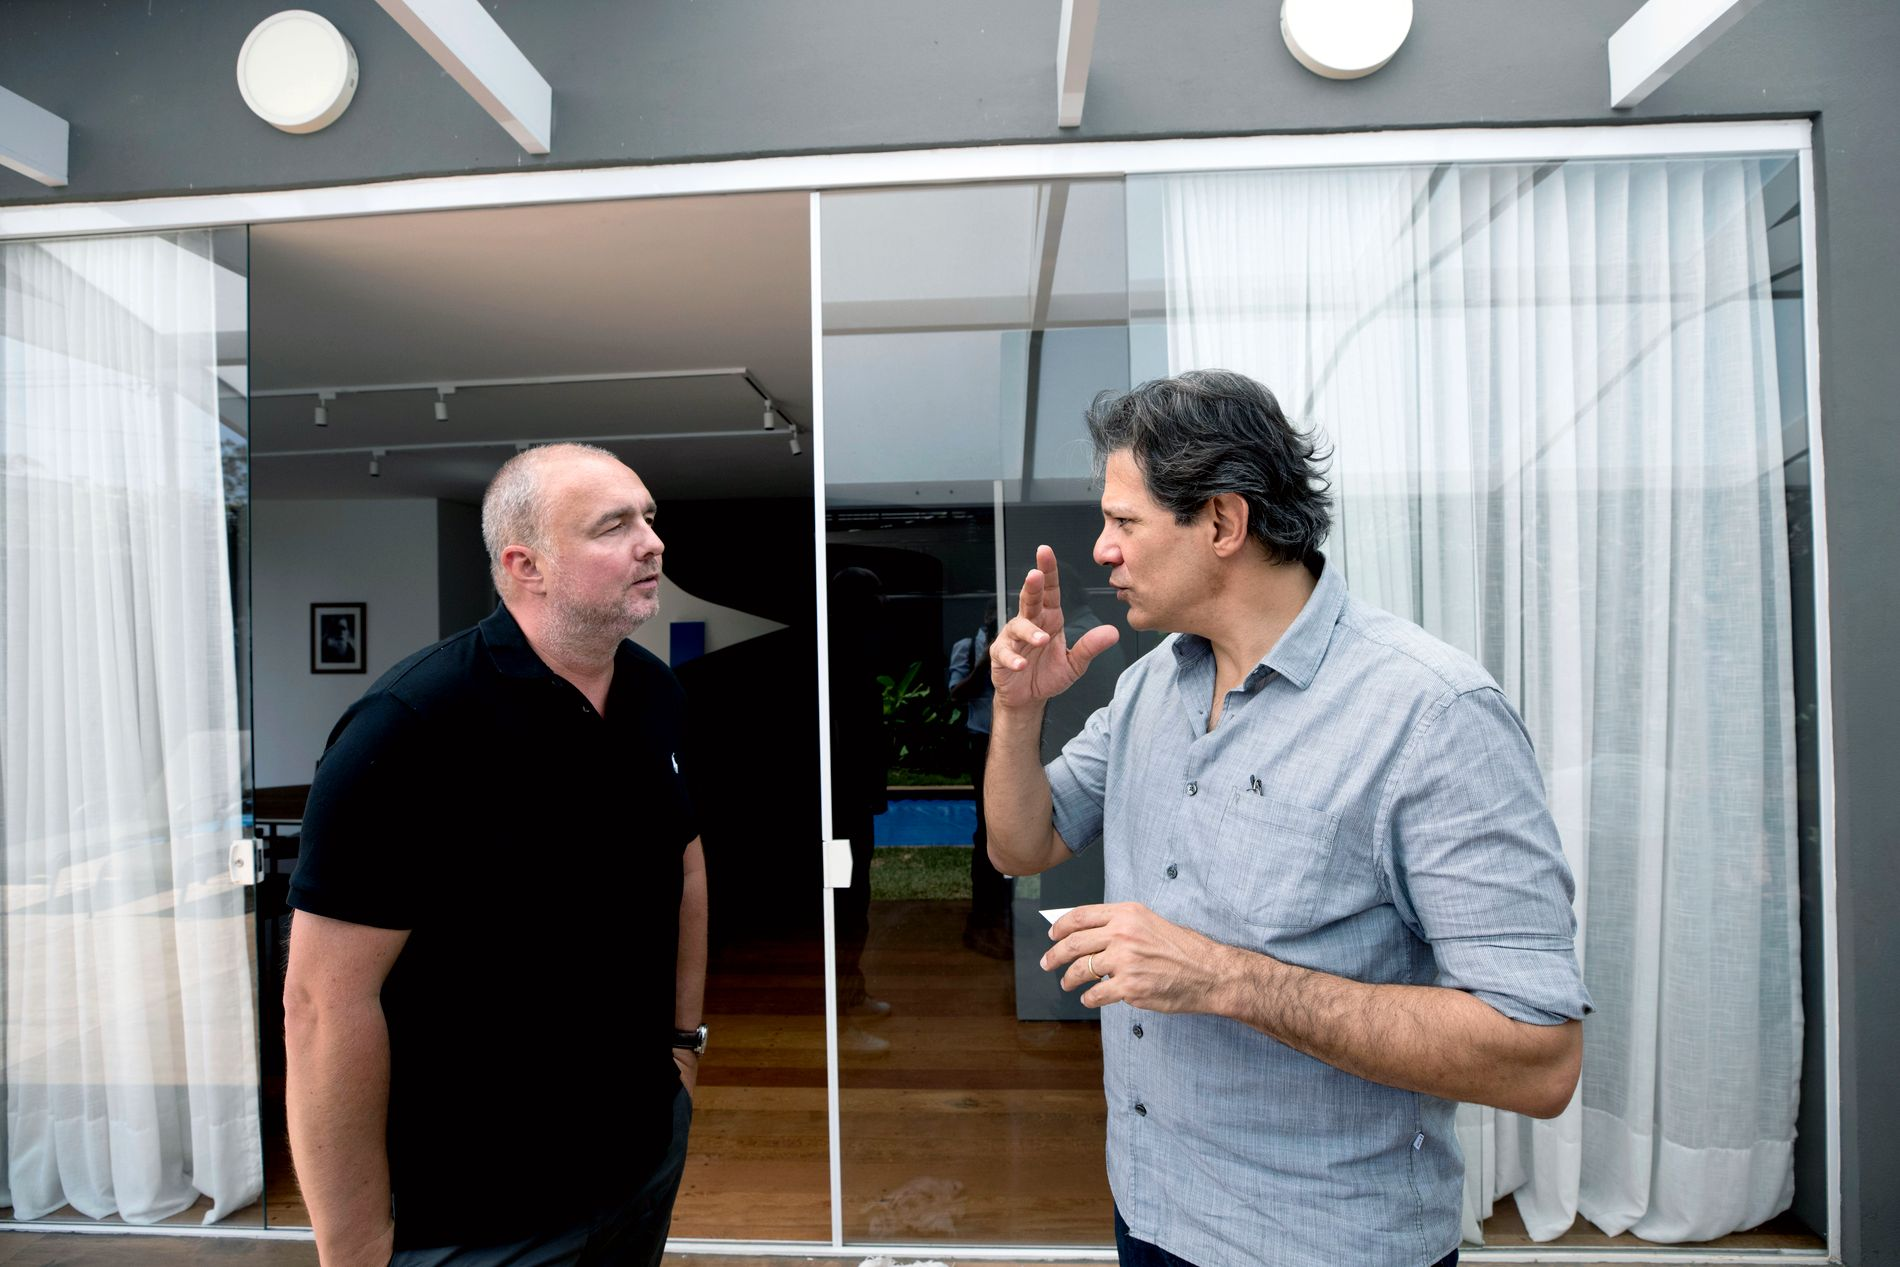 MØTTE VG: Fernando Haddad sa ja til et intervju med VGs USA-korrespondent Robert Simsø i sitt hjem i Sao Paulo i Brasil.